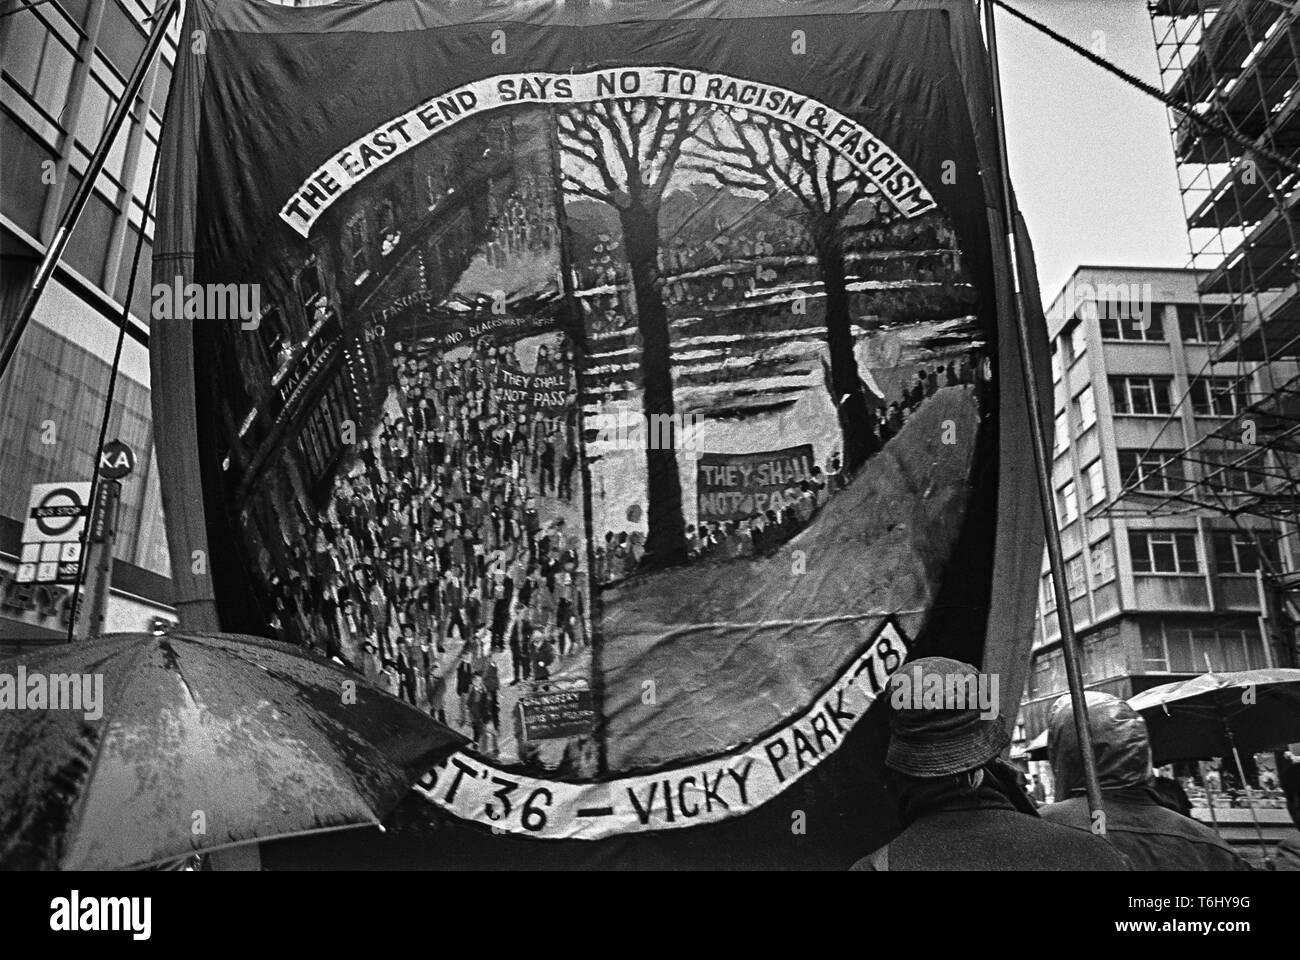 67/4  Tower Hamlets Whitechapel anti racist march 1978 - Stock Image